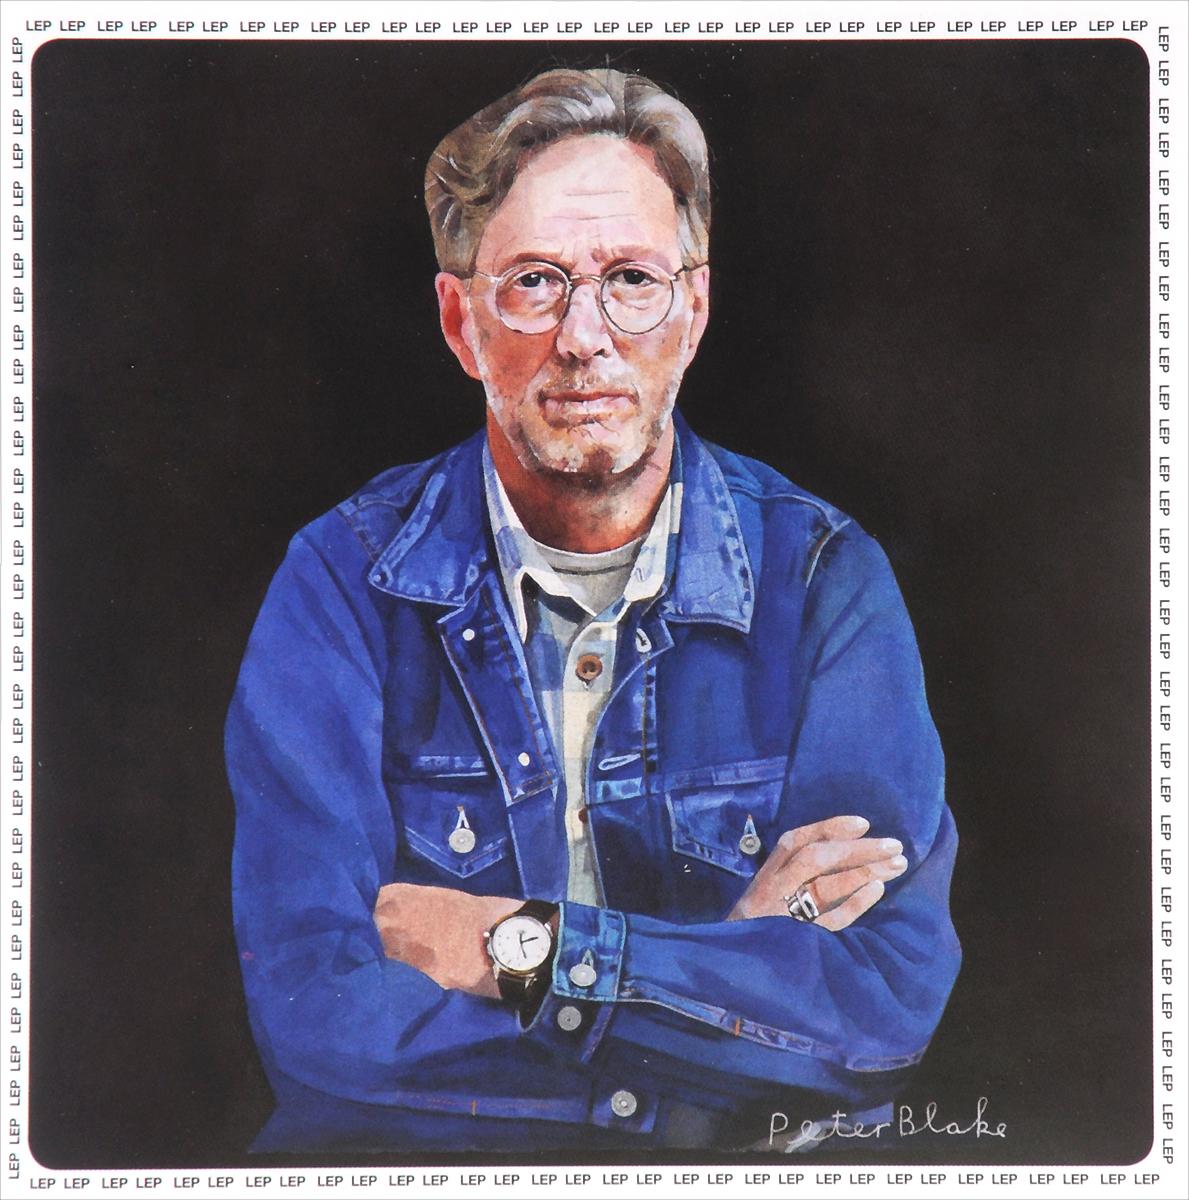 Эрик Клэптон Eric Clapton. I Still Do эрик клэптон eric clapton slowhand 35th anniversary edition lp